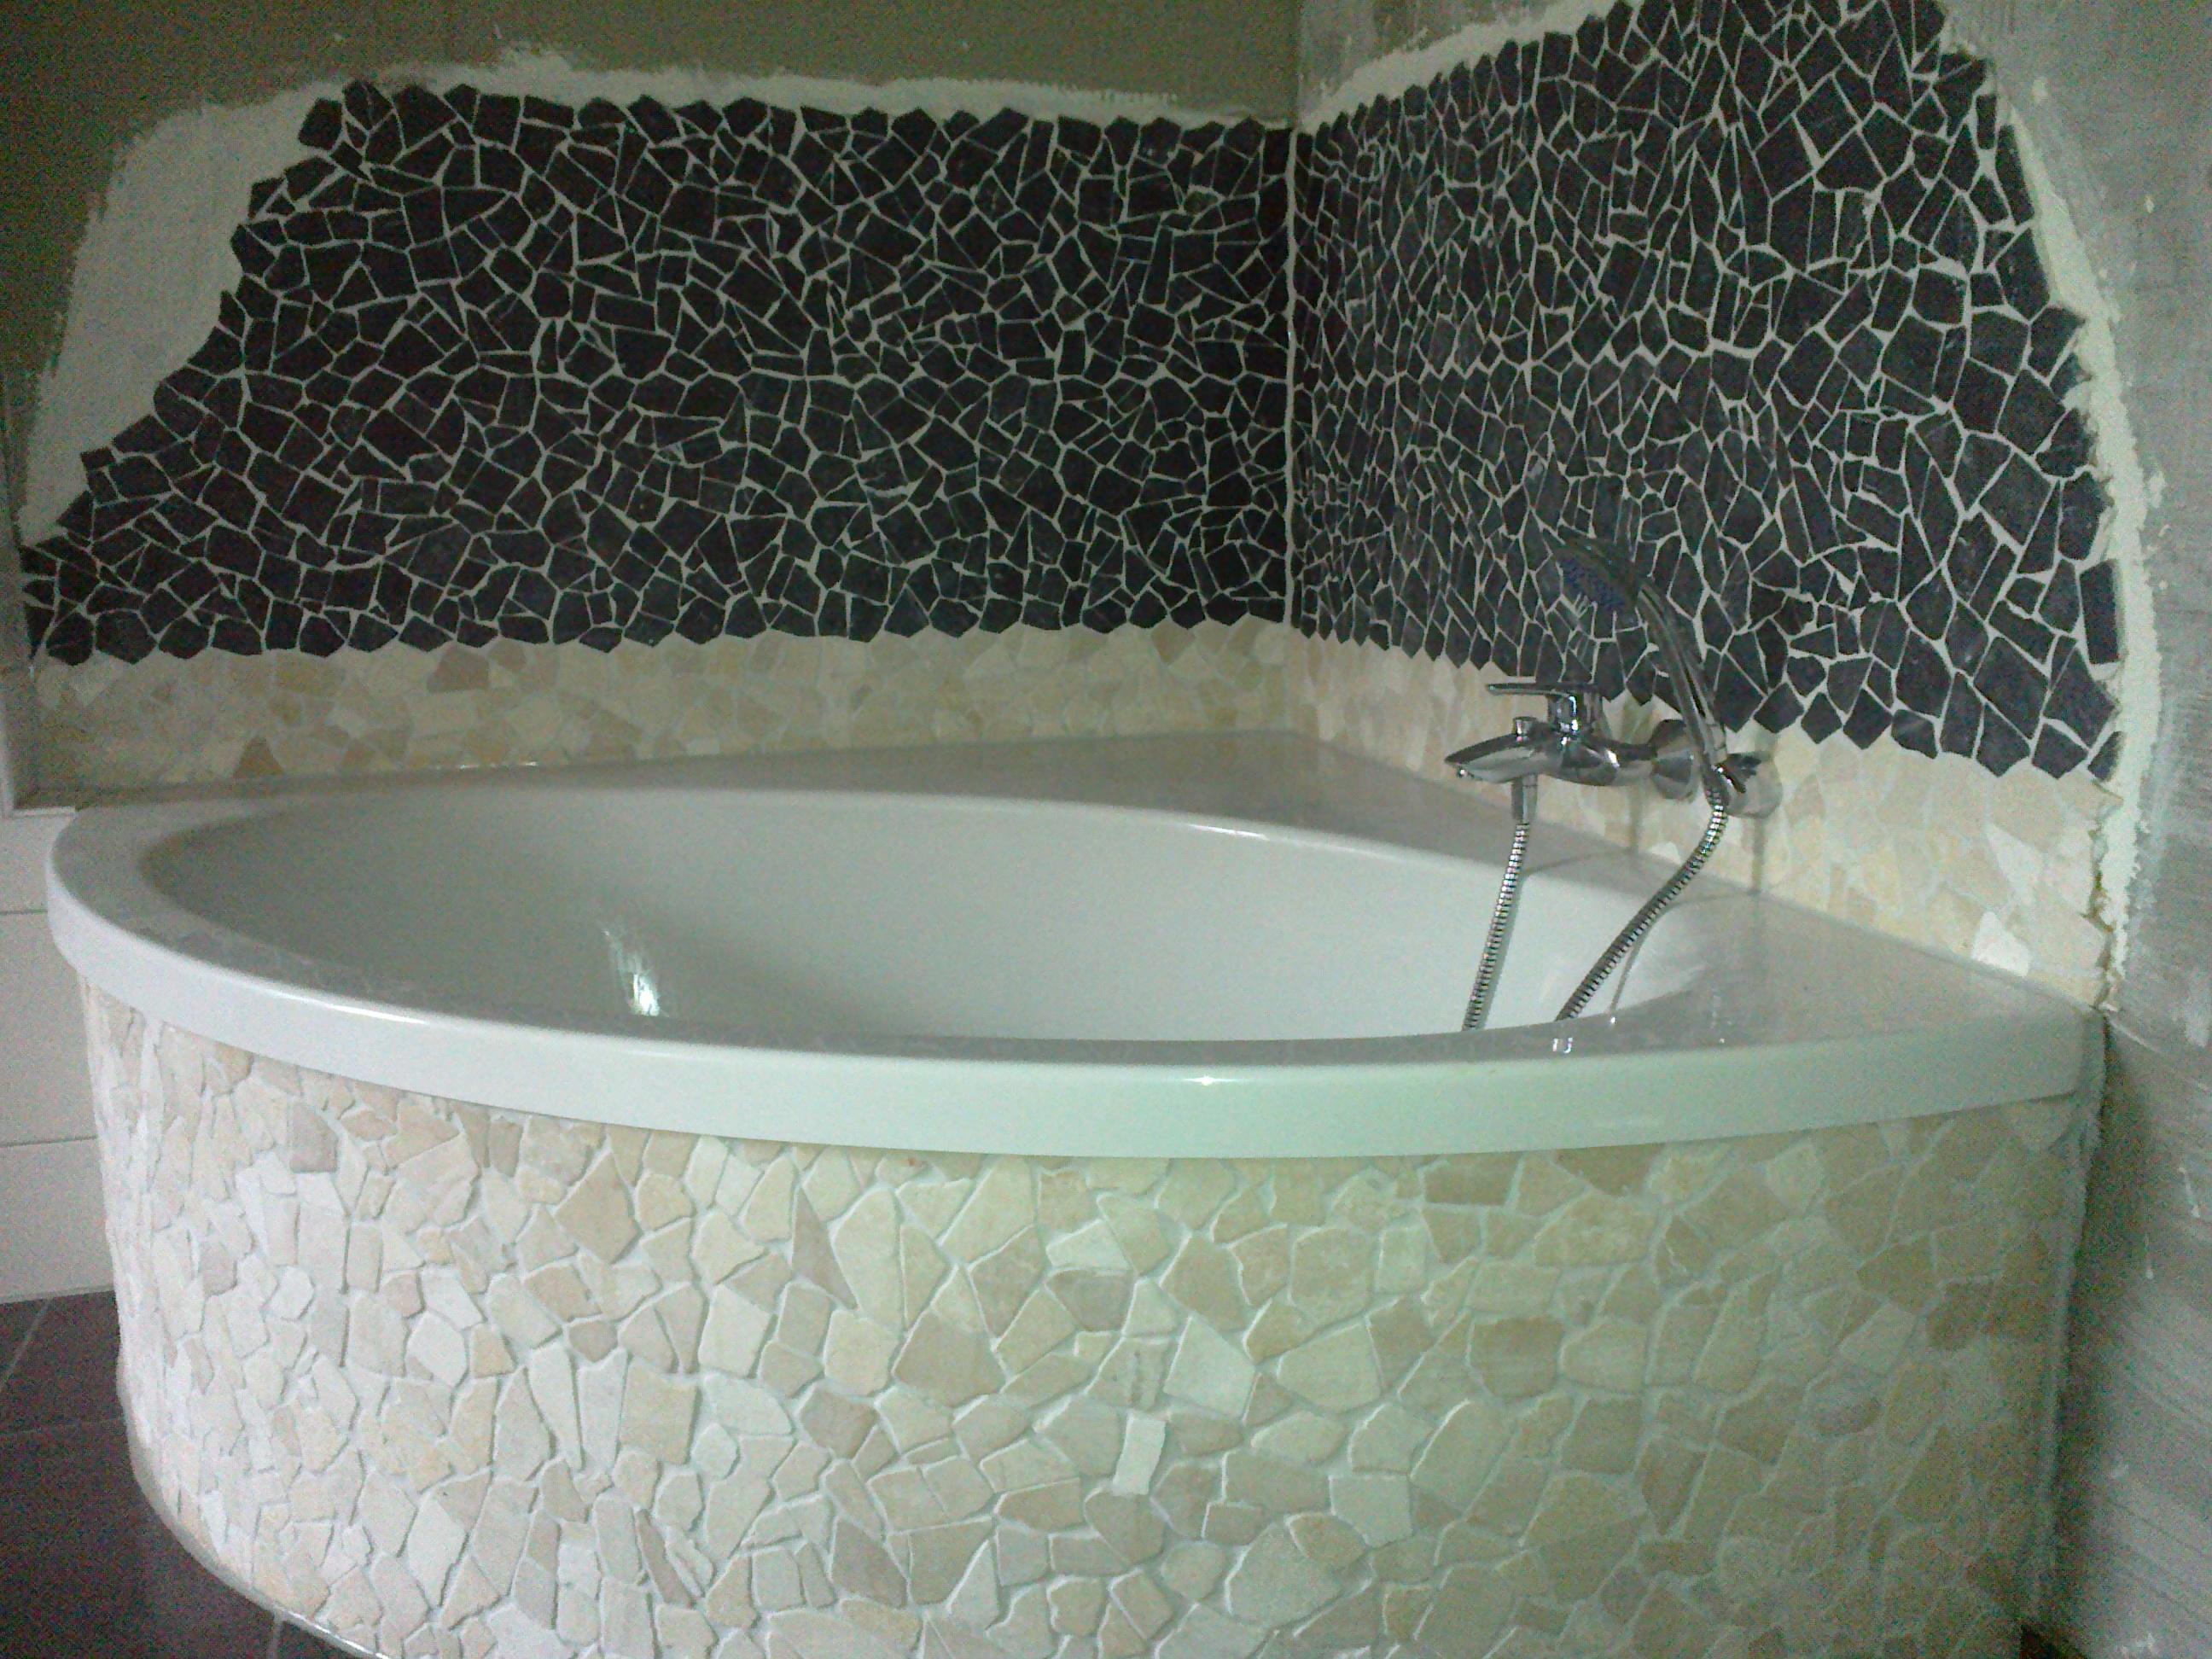 naturstein mosaik verlegen va08 kyushucon. Black Bedroom Furniture Sets. Home Design Ideas